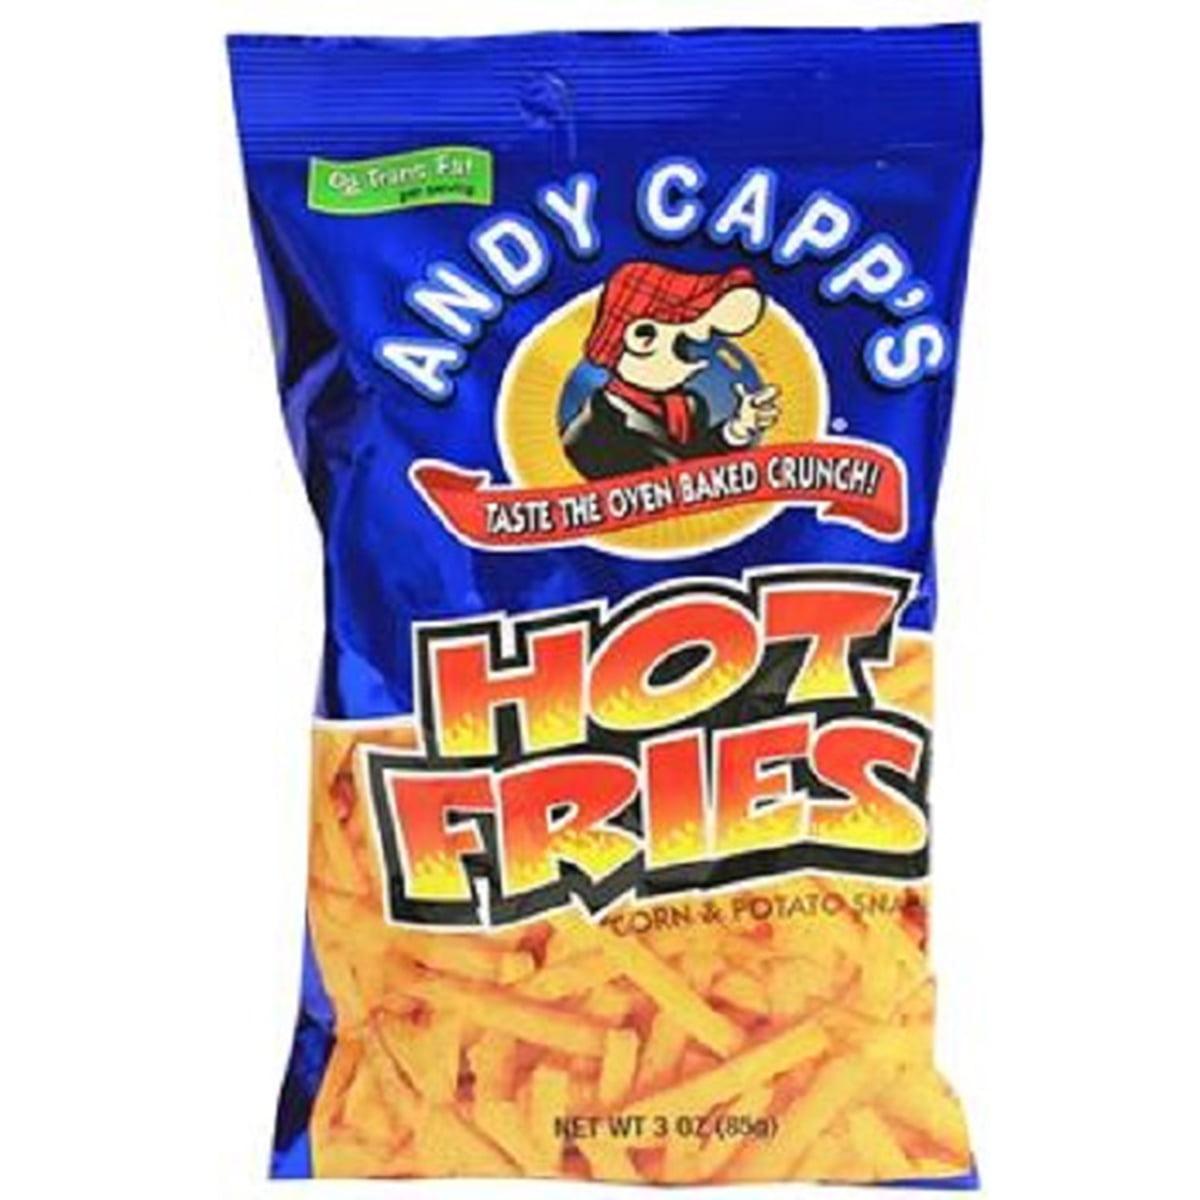 Andy capp hot fries